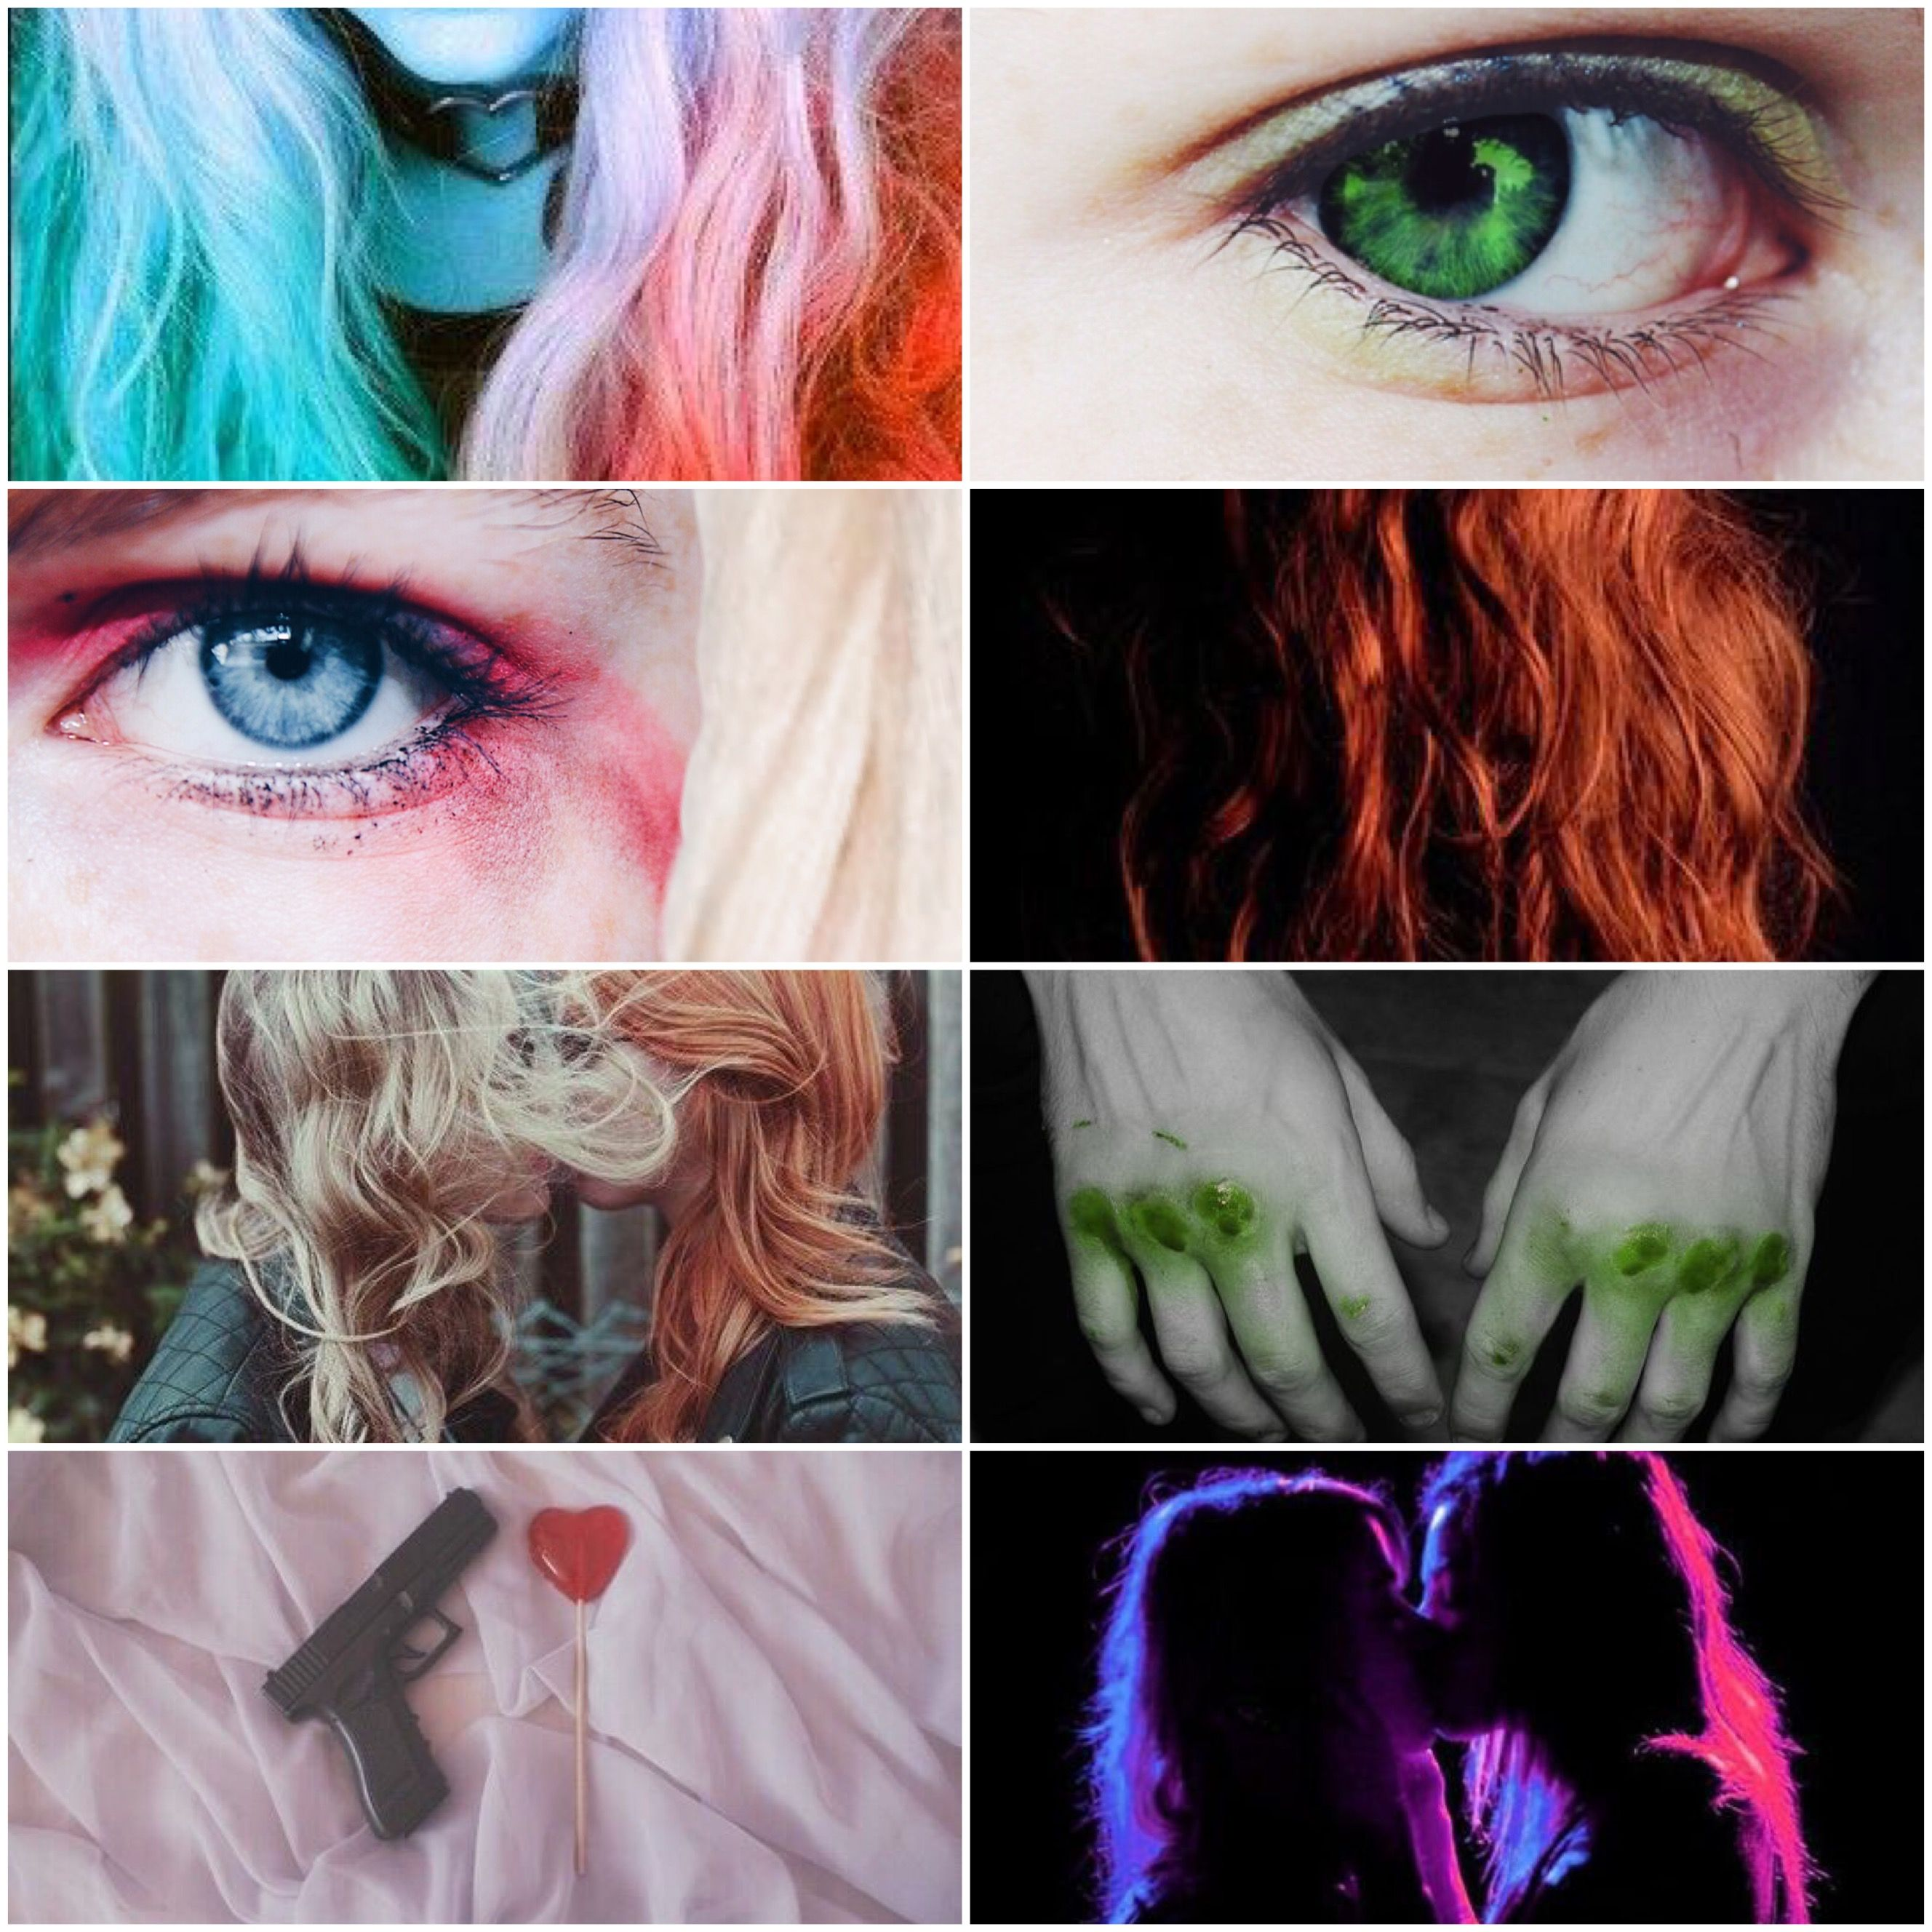 Harley quinn poison ivy lesbian